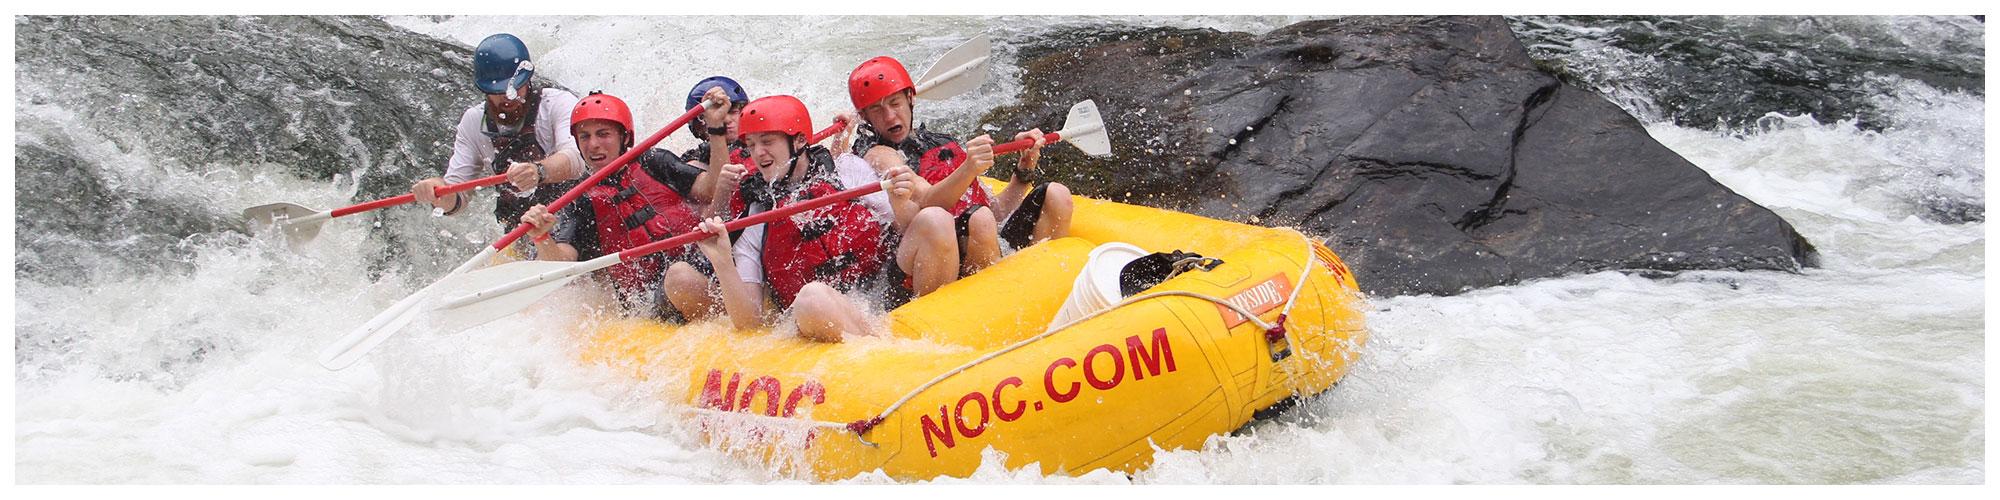 NOC Nantahala Outdoor Center (Header Background) | Gatlinburg Attractions